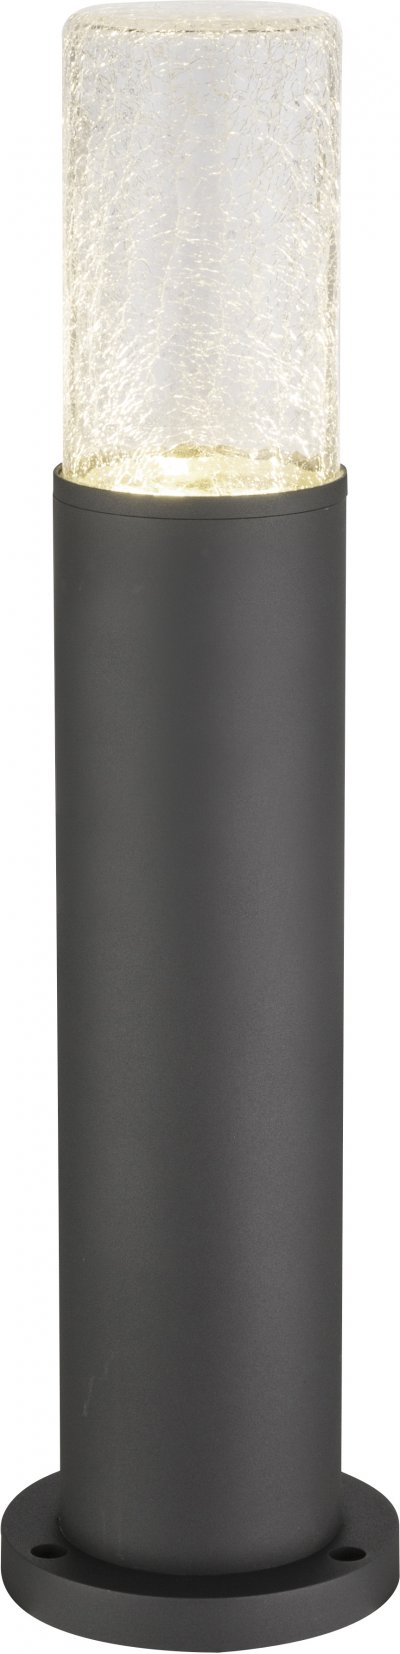 Светильник уличный Globo 32409S1Ожидается<br><br><br>Тип цоколя: LED<br>Цвет арматуры: черный<br>Диаметр, мм мм: 125<br>Высота, мм: 500